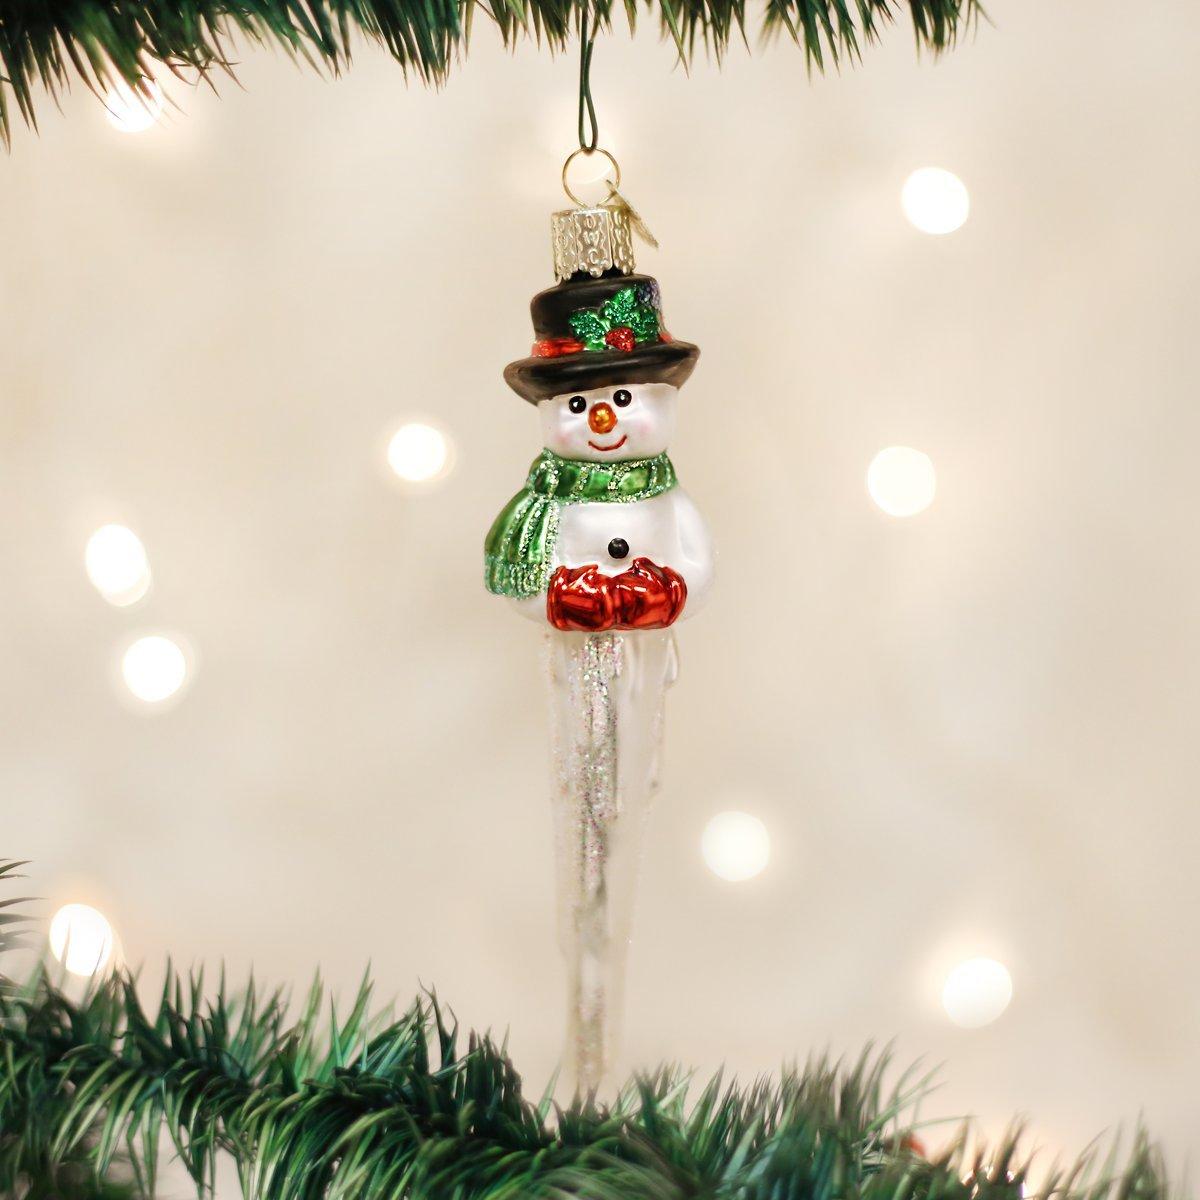 Amazon.com: Old World Christmas Ornaments: Icicle Snowman Glass ...